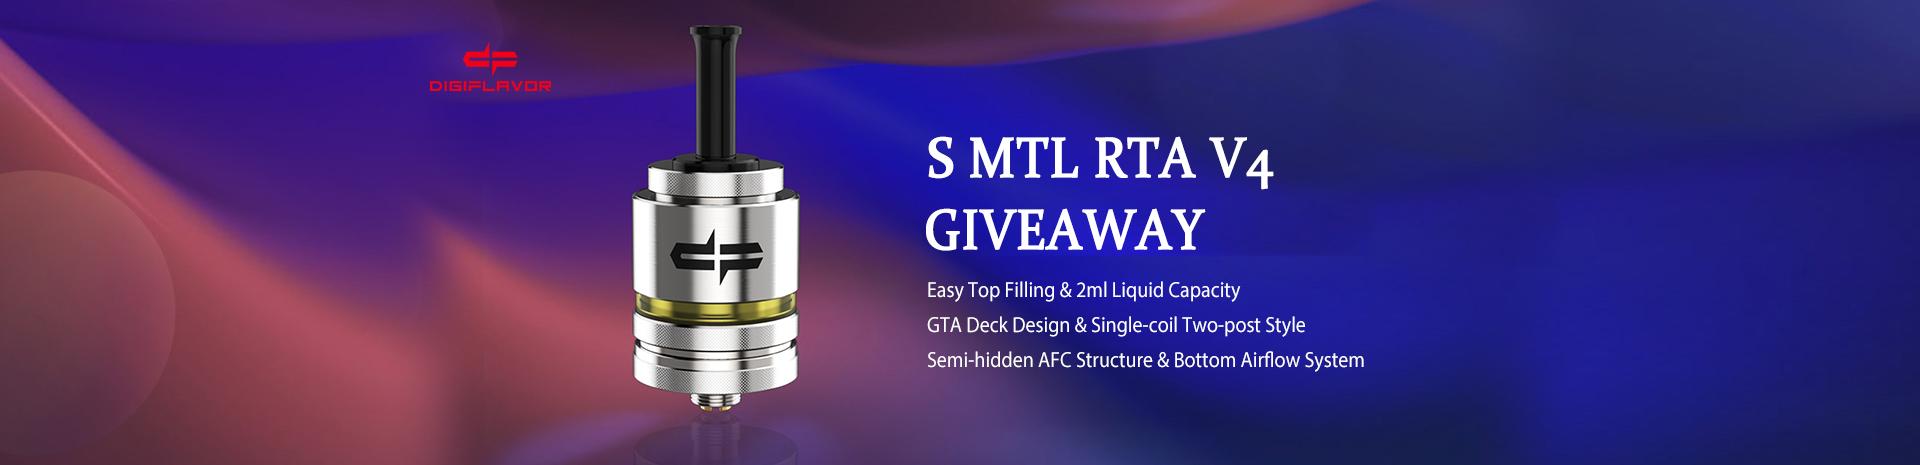 Digiflavor Siren MTL RTA V4 Giveaway Banner